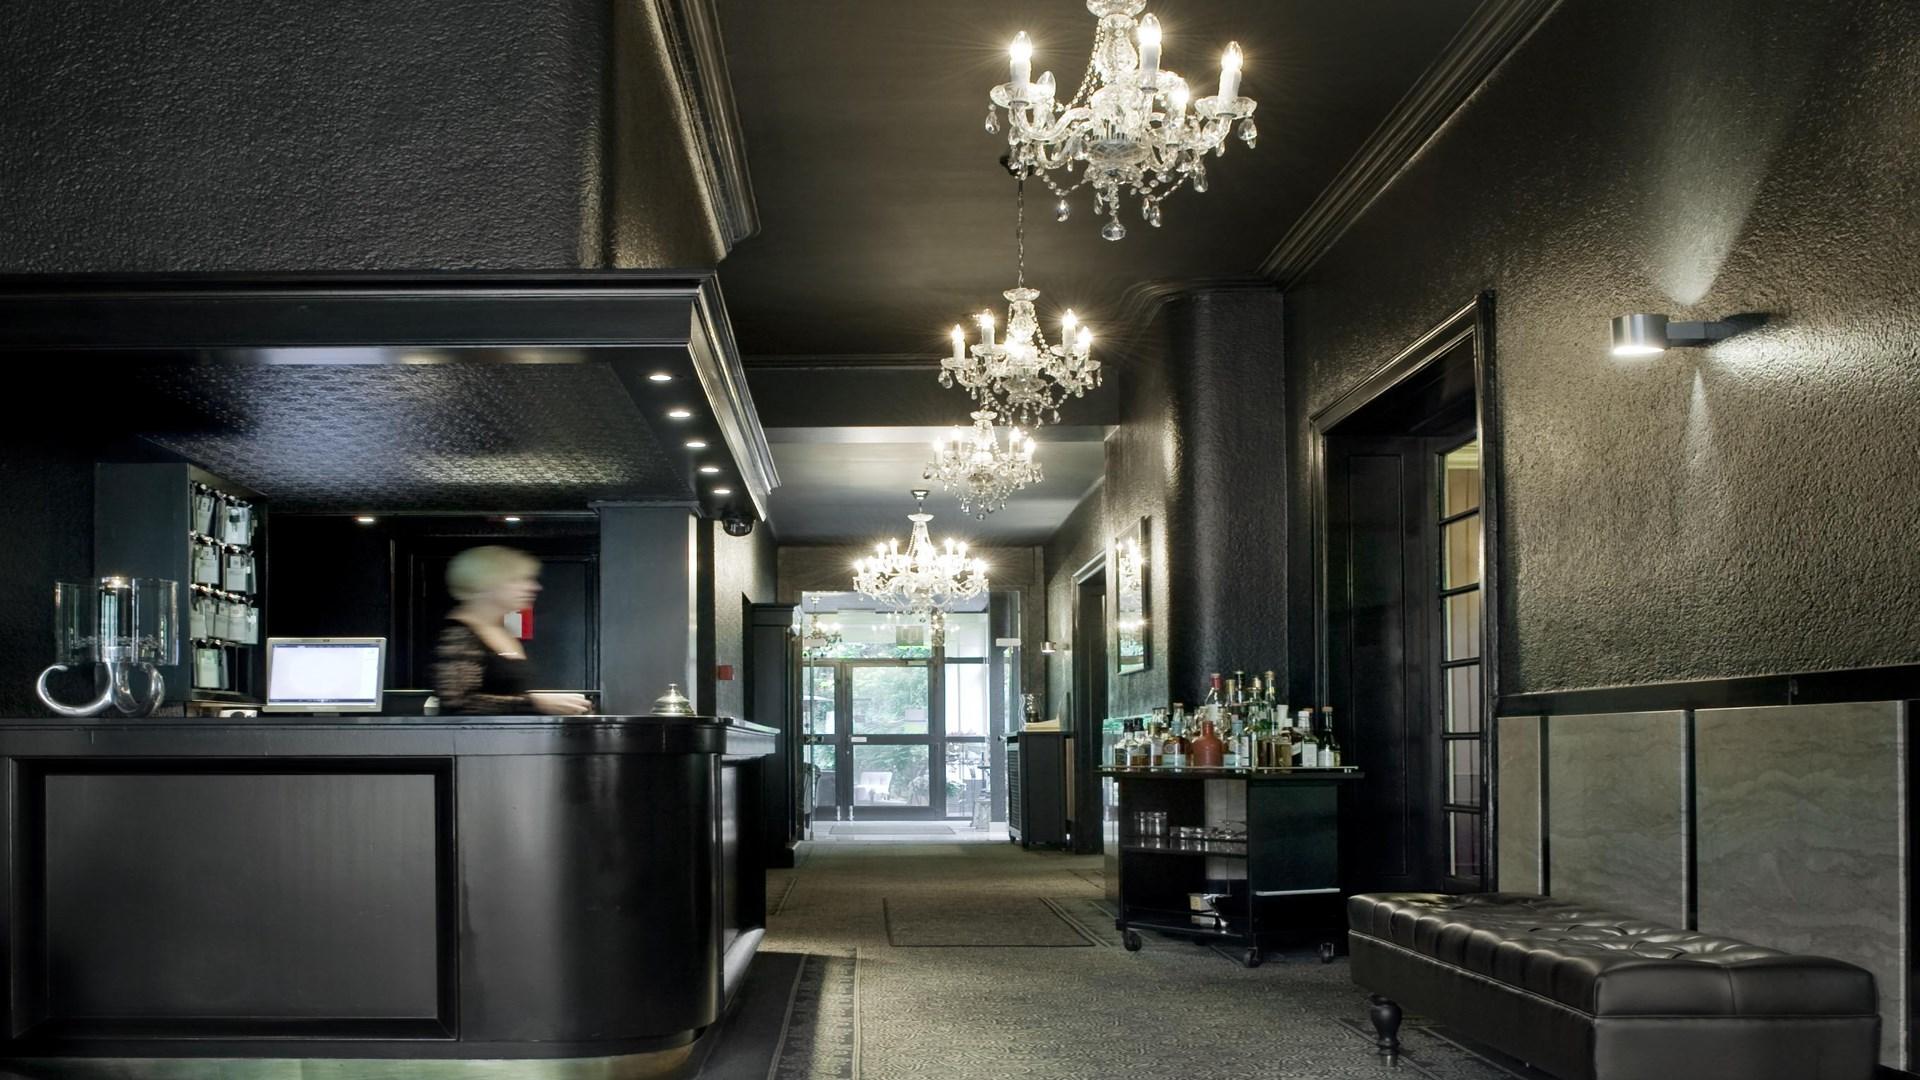 HOTEL MARDAGA SHOPPEN